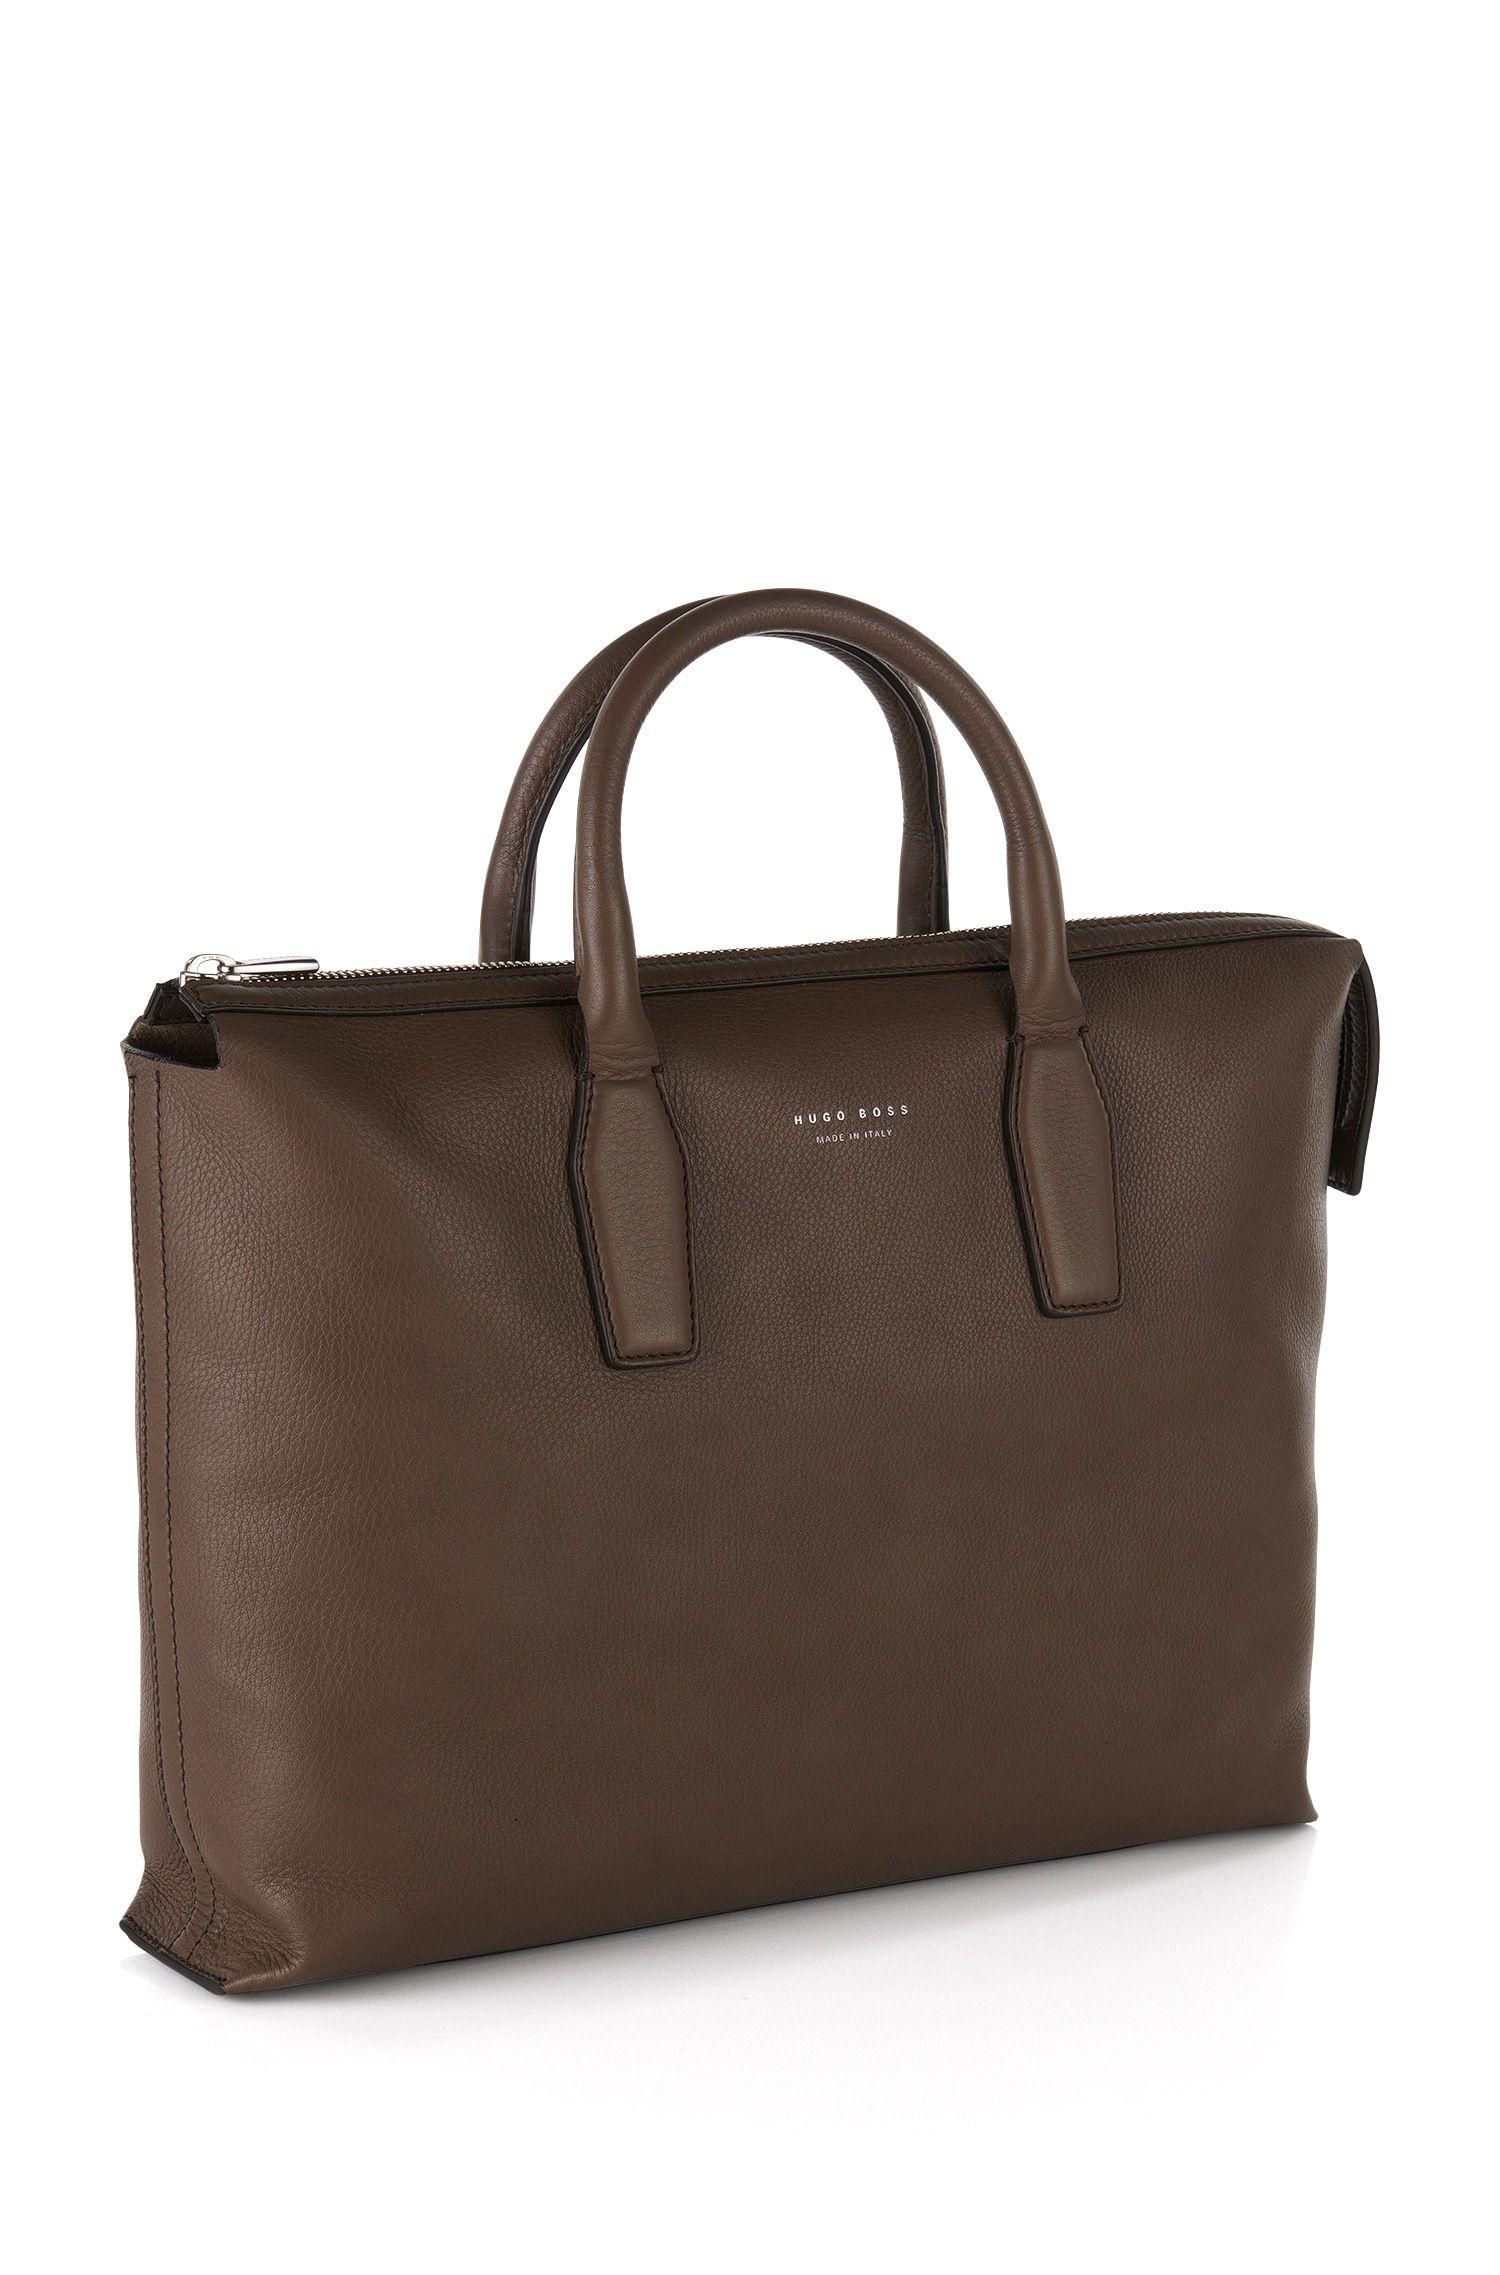 'Softy S Doc' | Italian Leather Work Bag